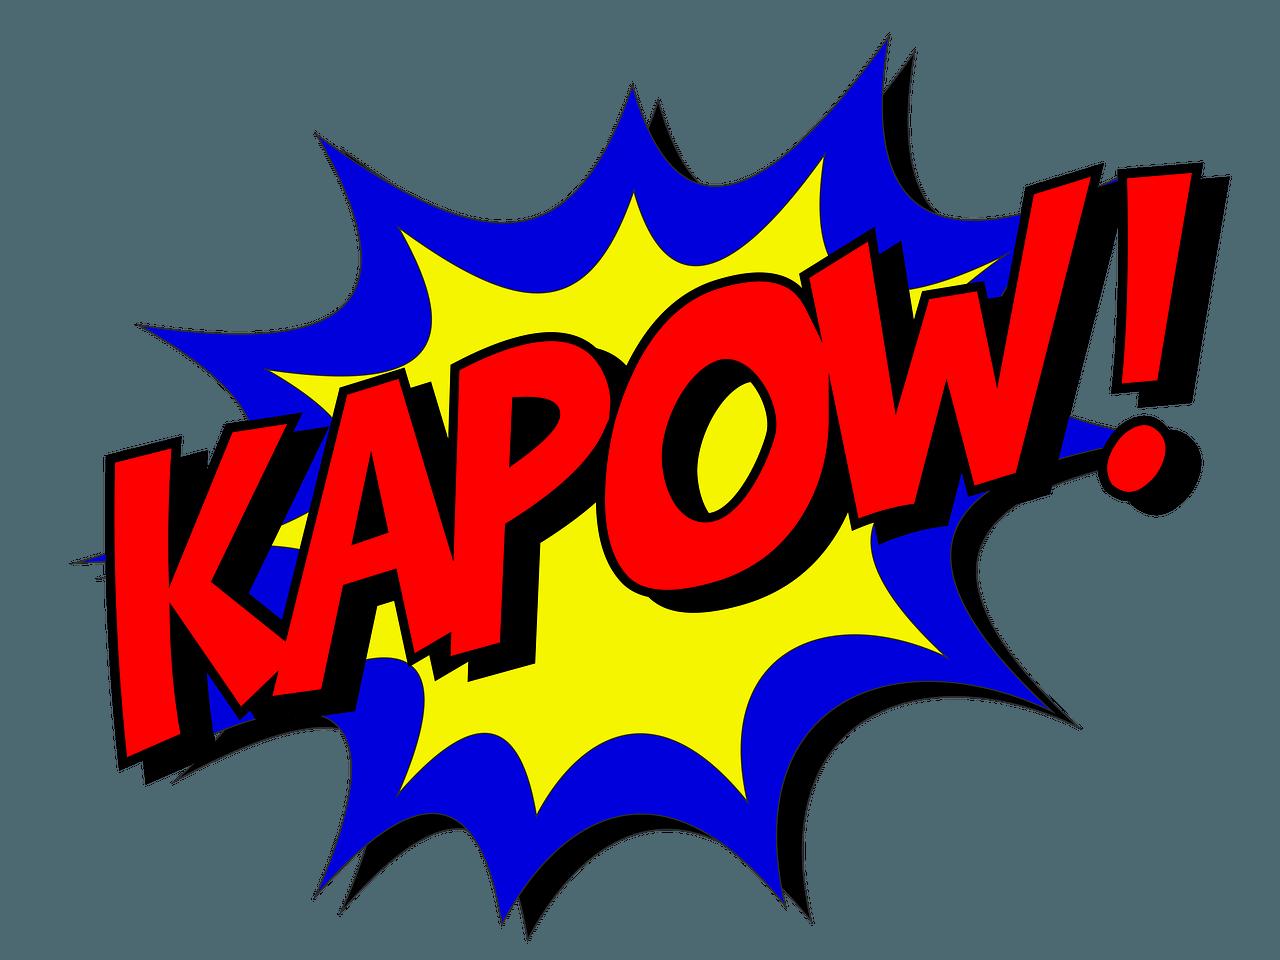 Digital Marketing Alone Will Not Make You a Superhero